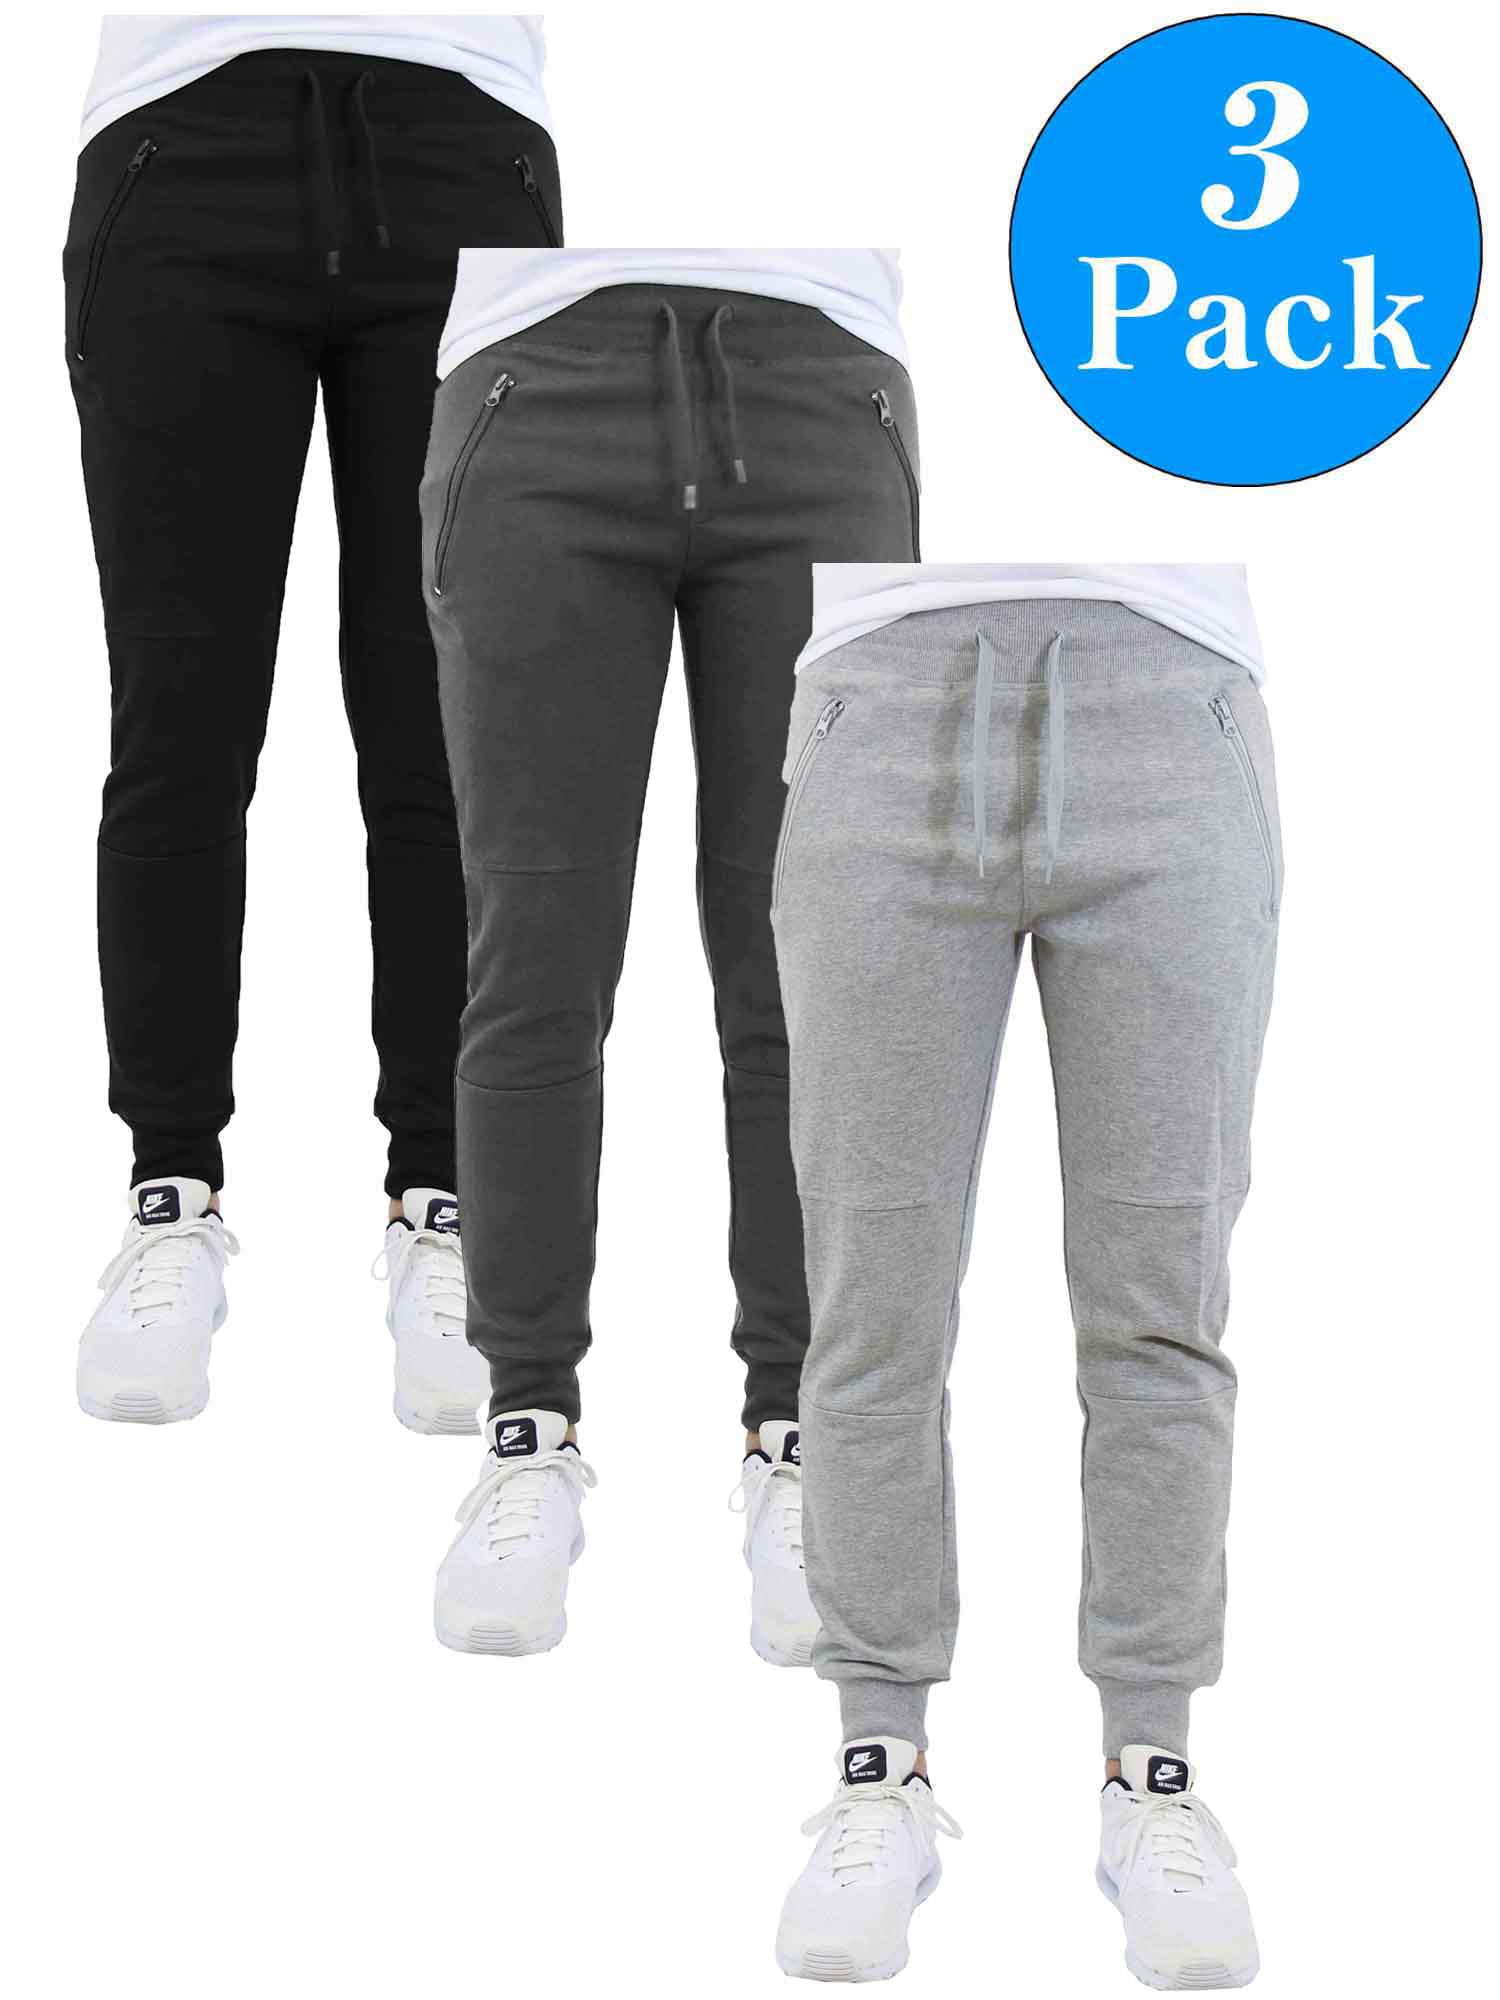 Men's Slim-Fit Jogger Sweatpants With Zipper Pockets (3-Pack)